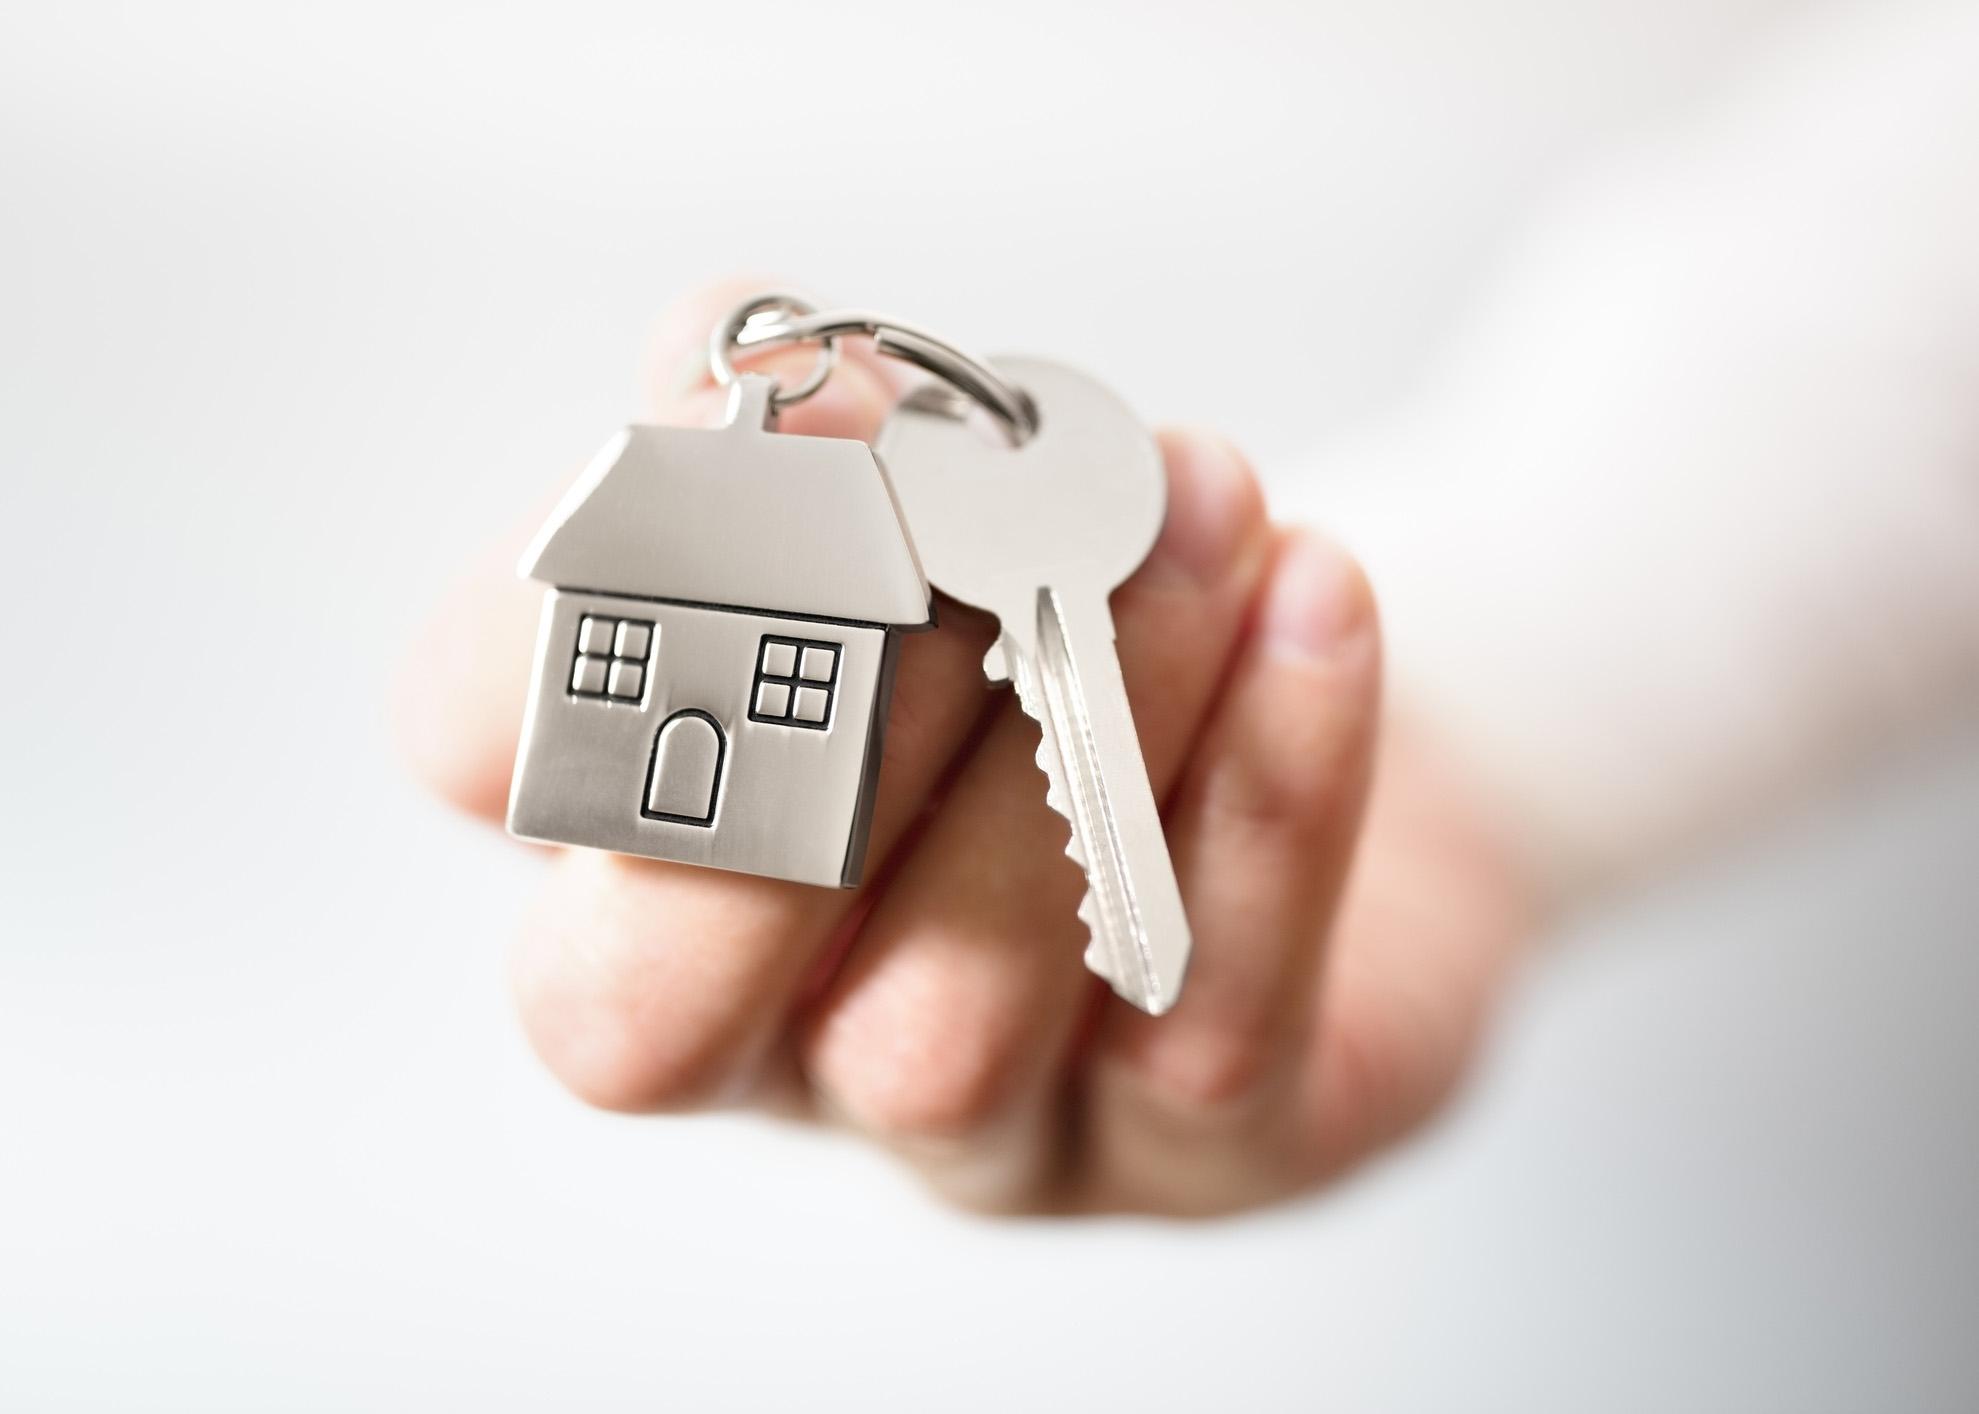 chaves casa renda